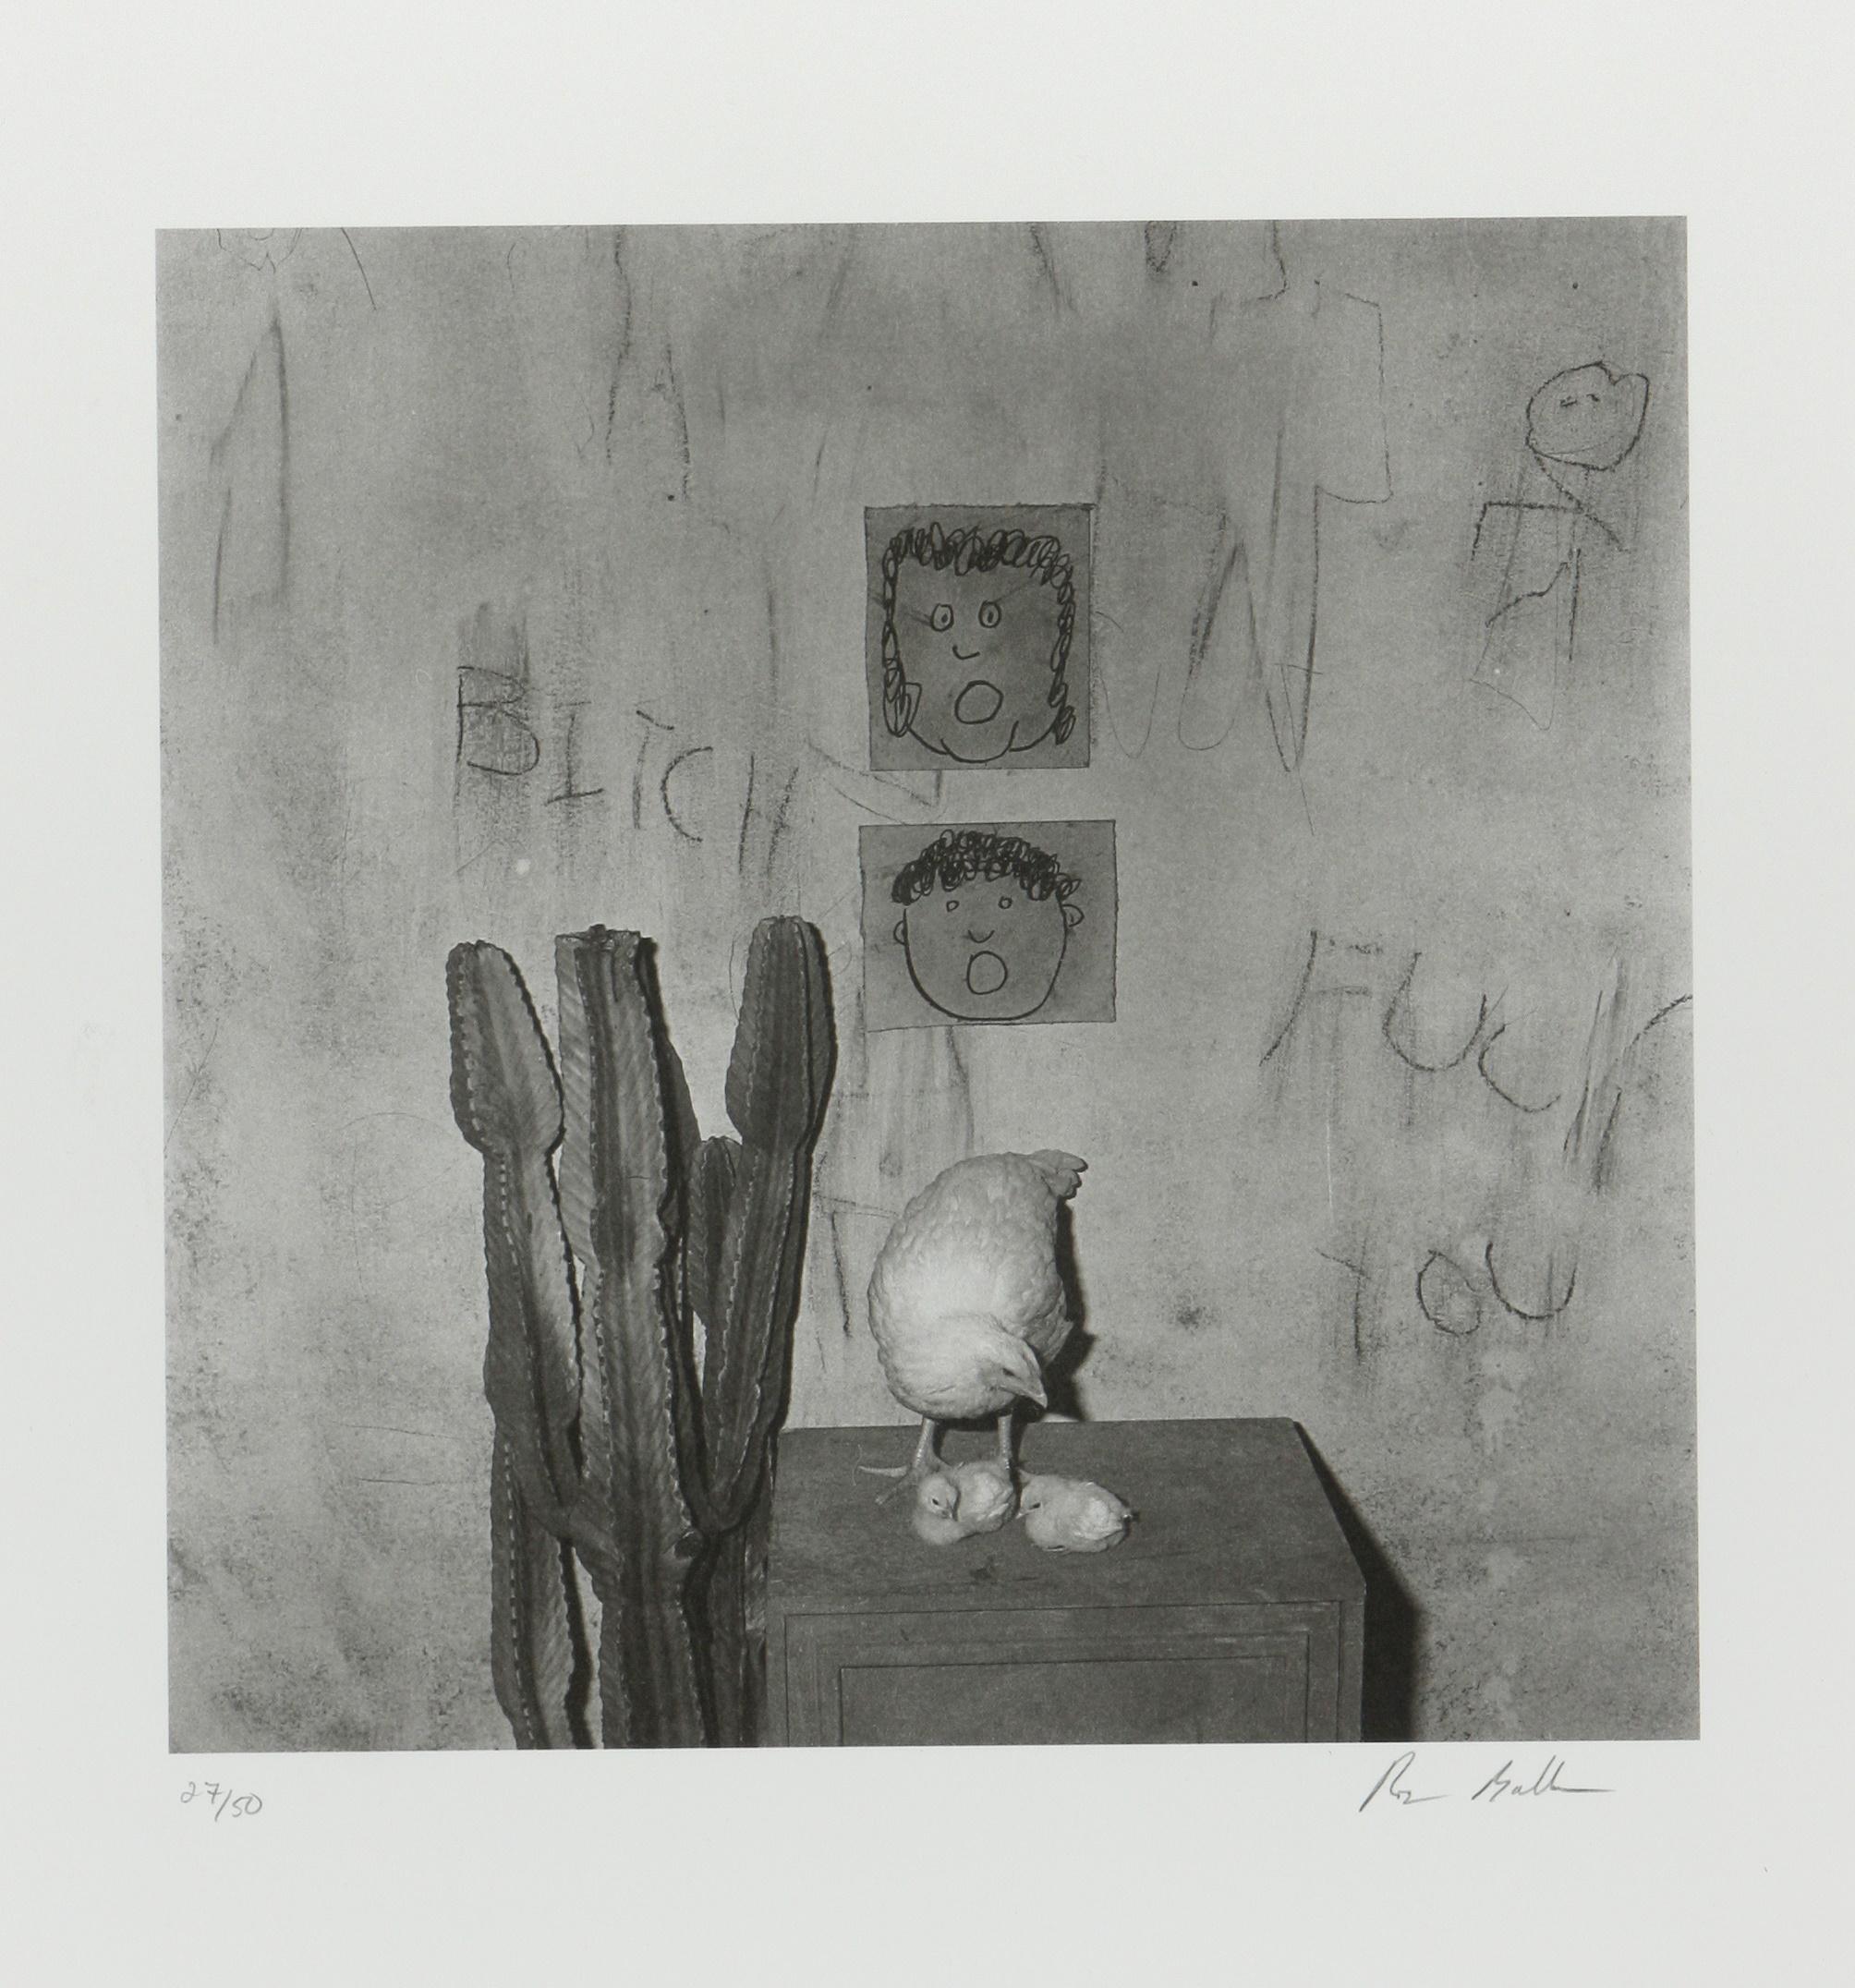 Roger Ballen (United States 1950-) Untitled